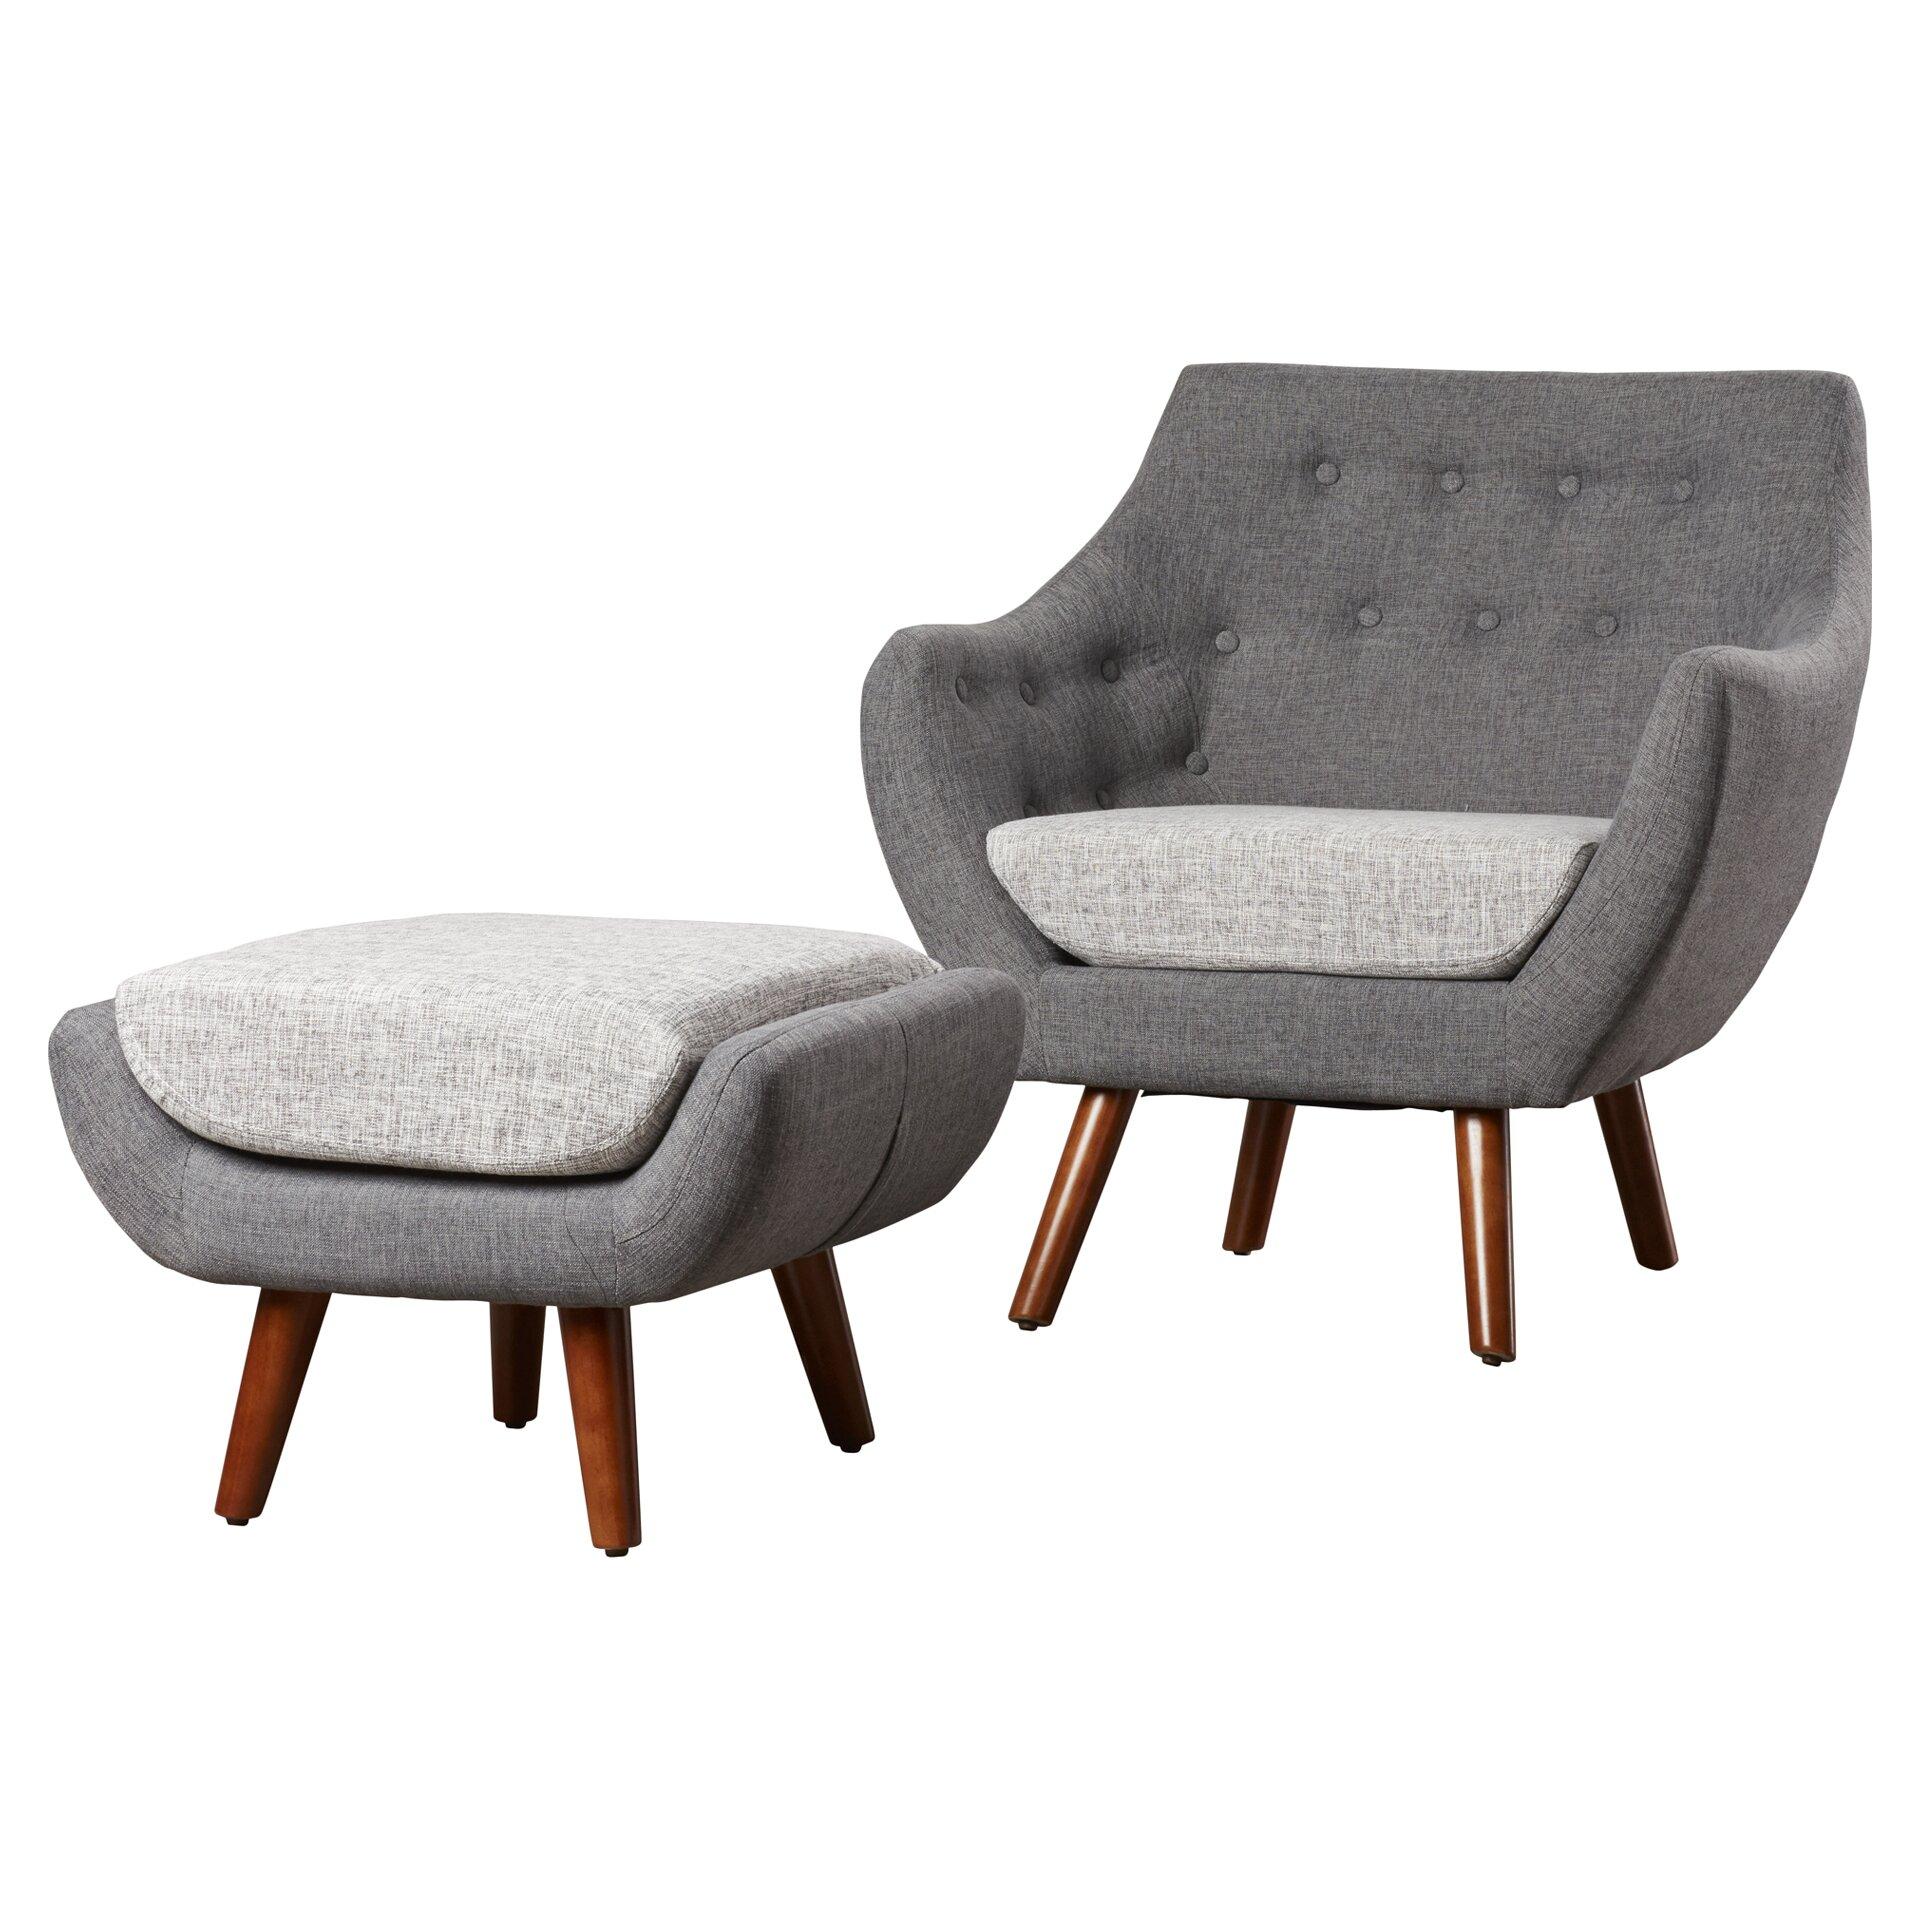 Armchair With Ottoman Set De Sede Ds 85 Leather Armchair